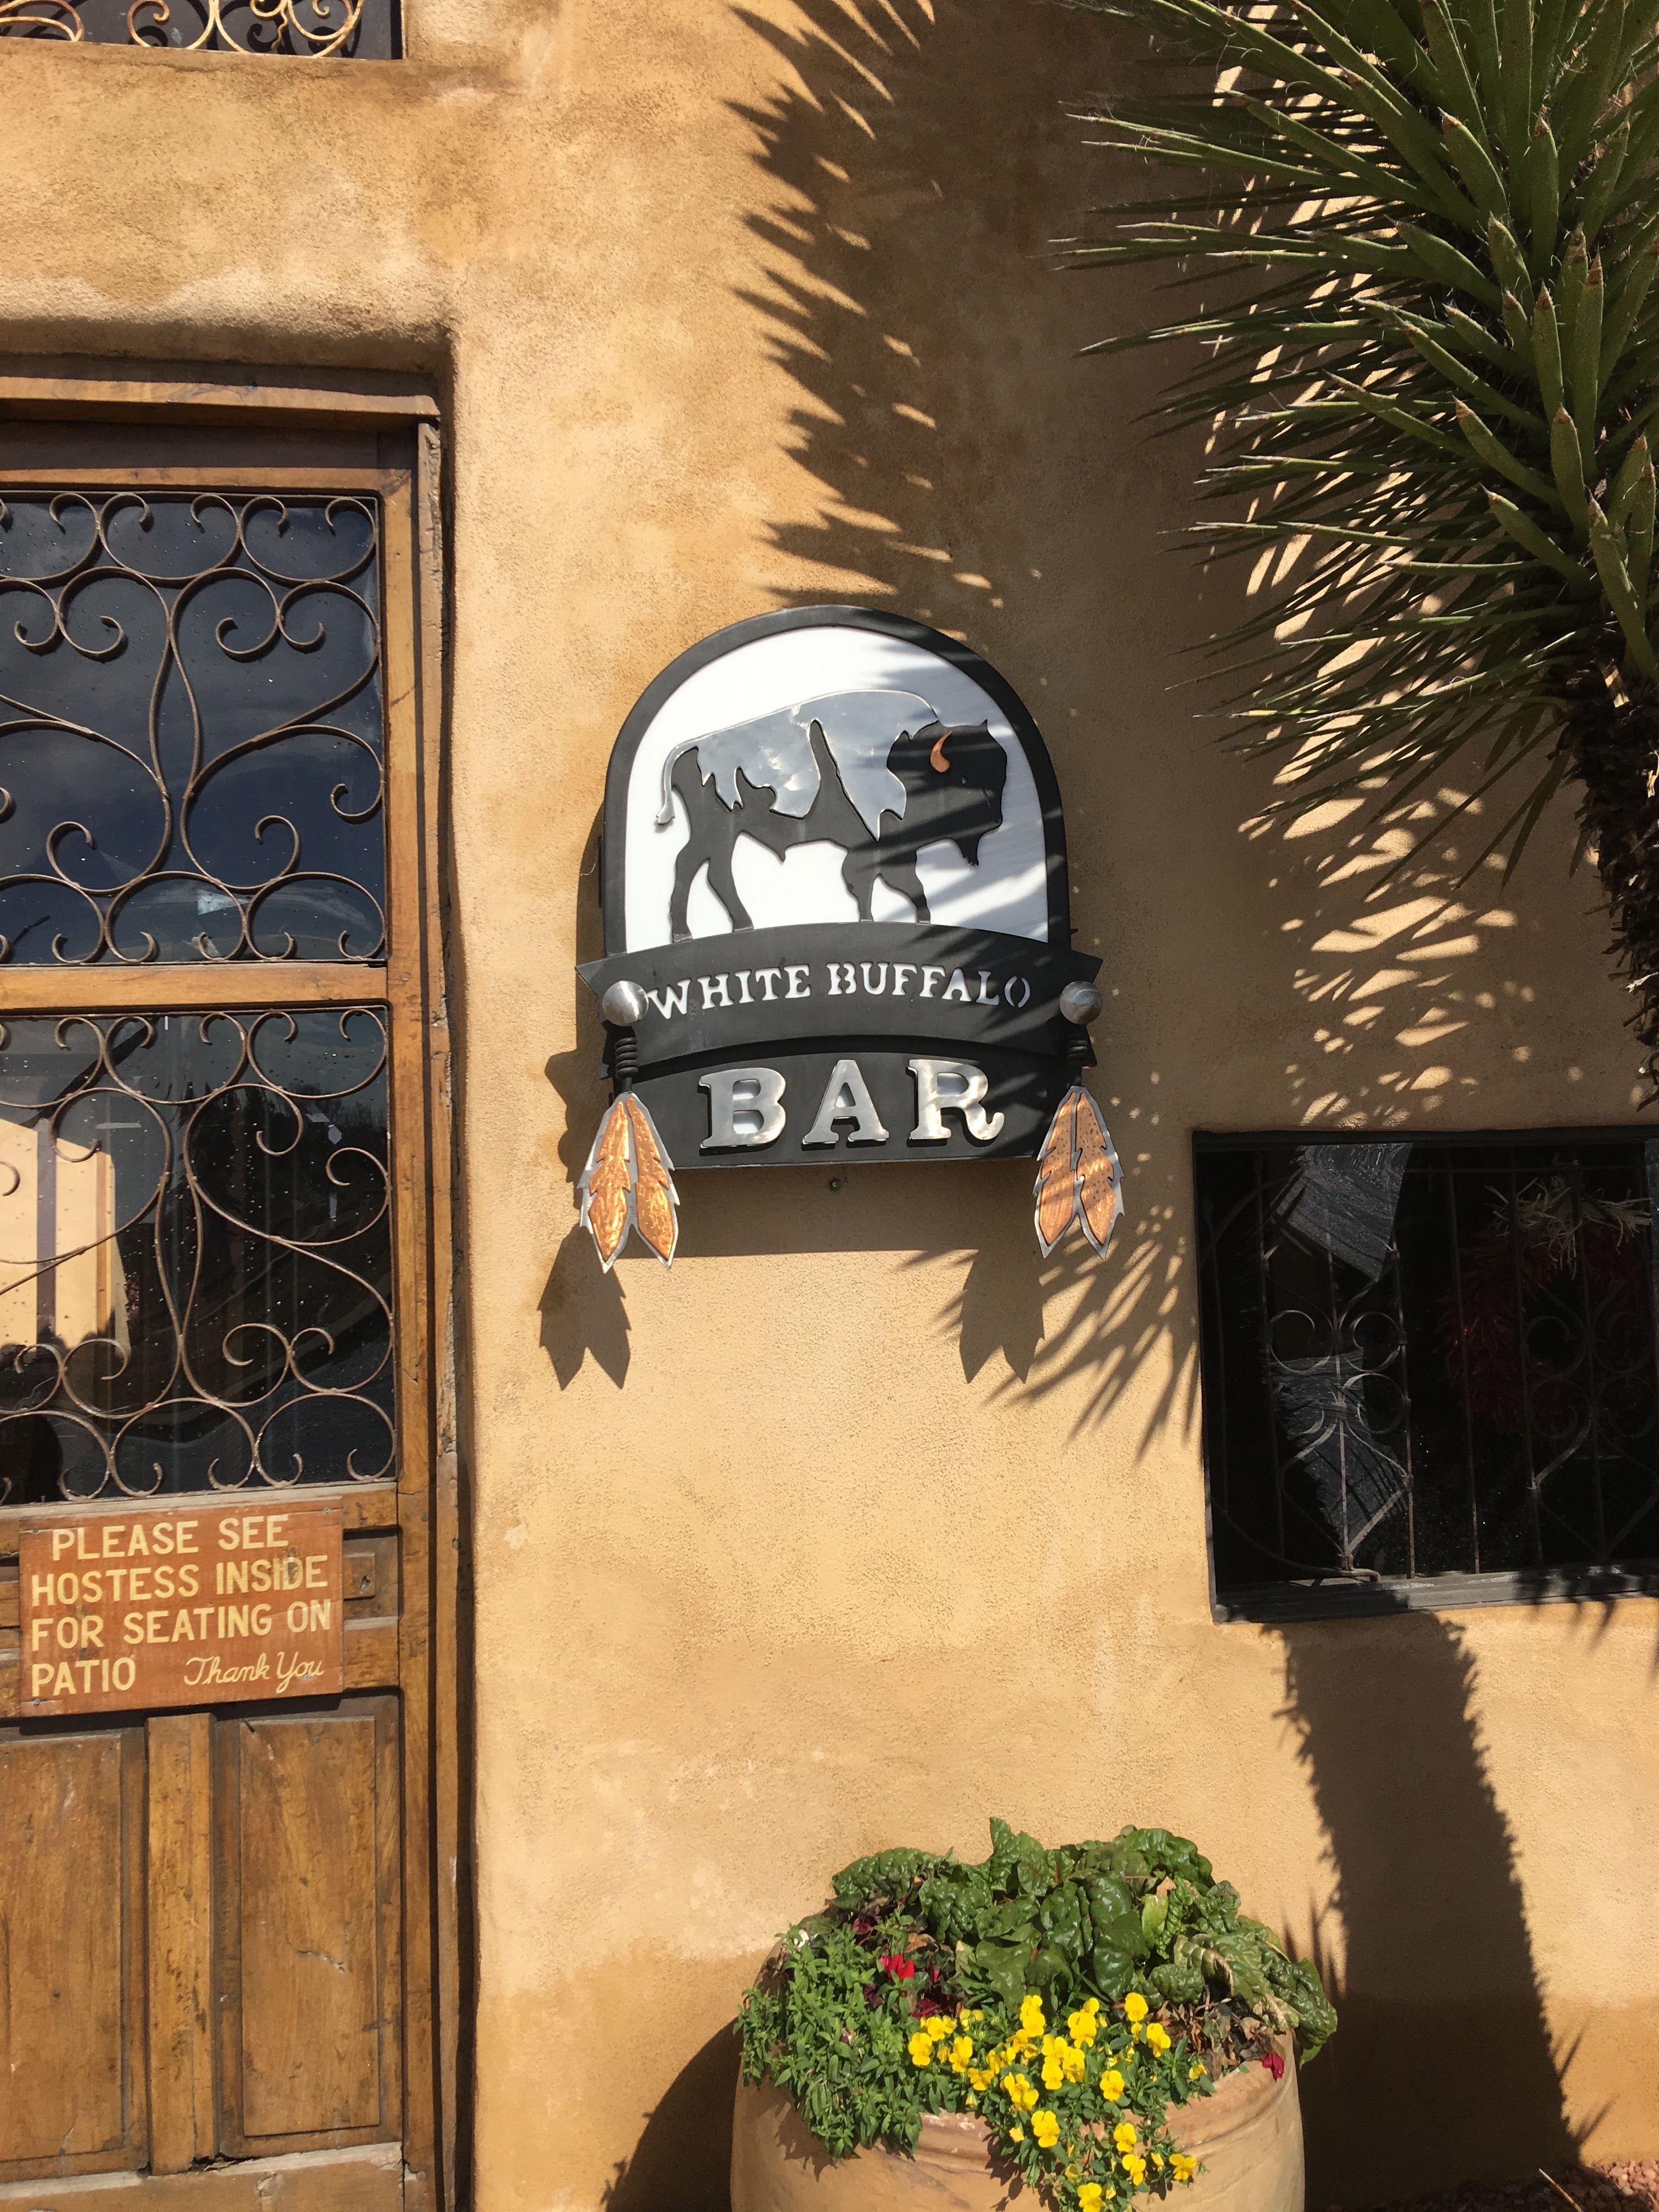 White Buffalo Bar at Gage Hotel in Marathon, TX. By Yram Martinez